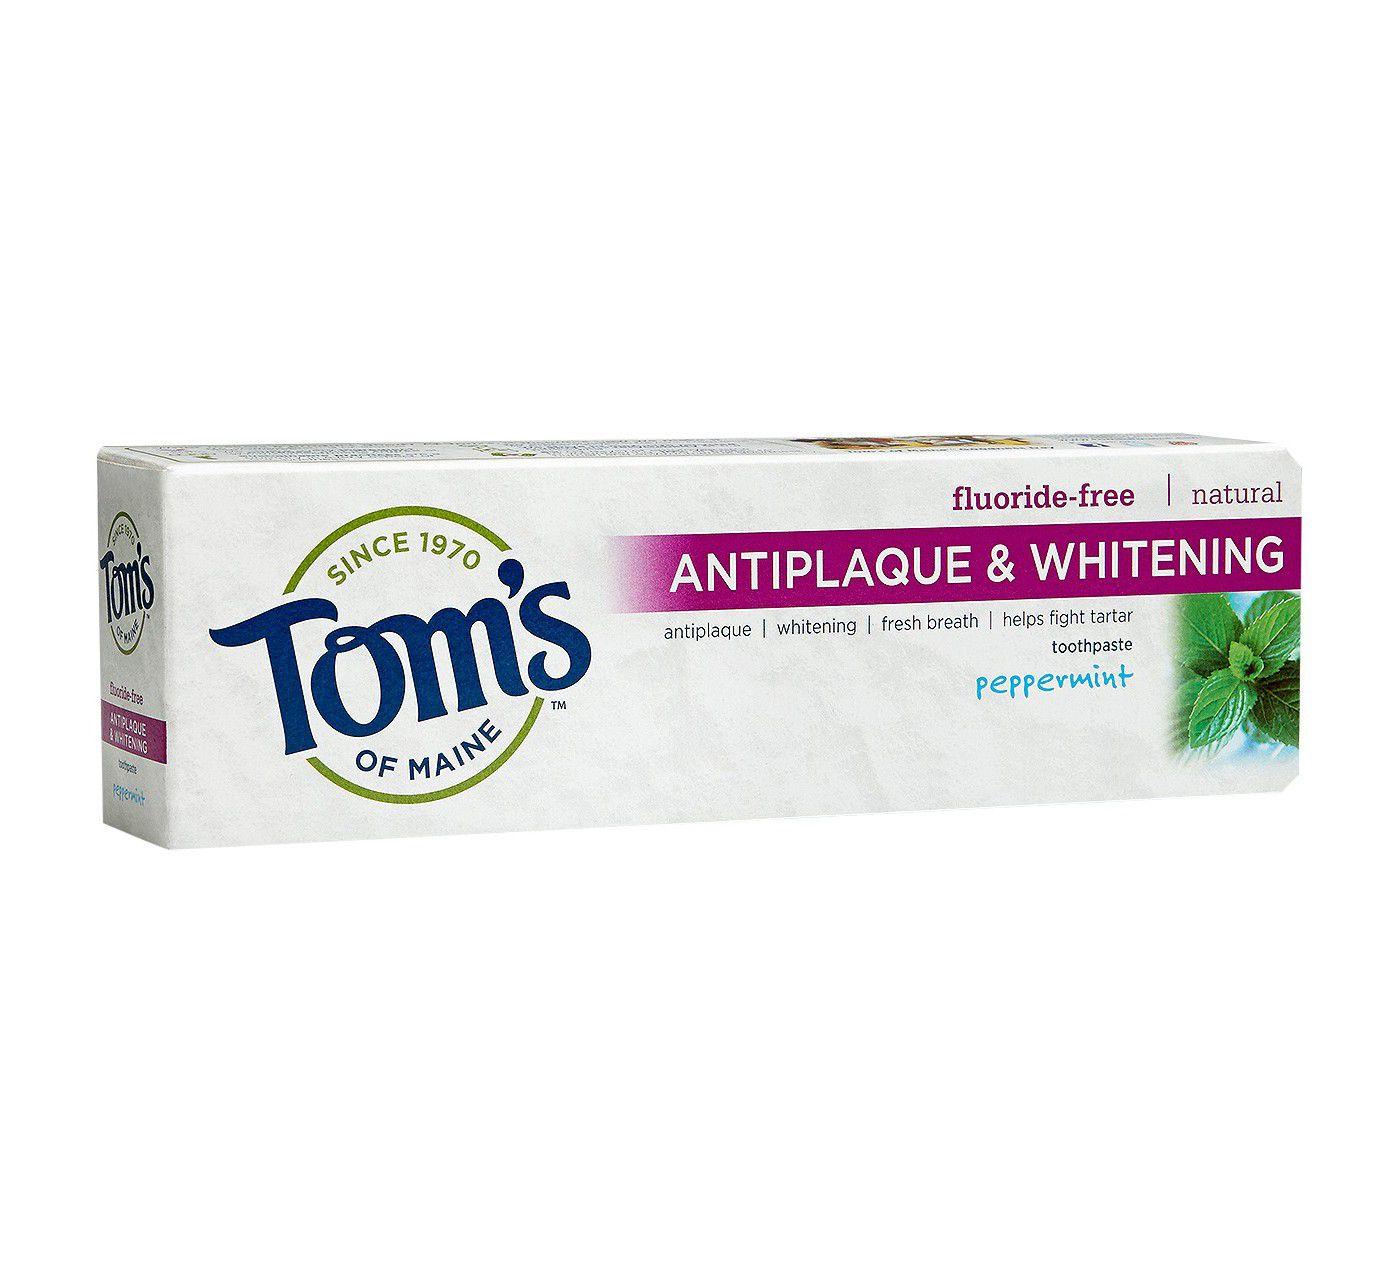 Tom's of Maine Antiplaque & Whitening